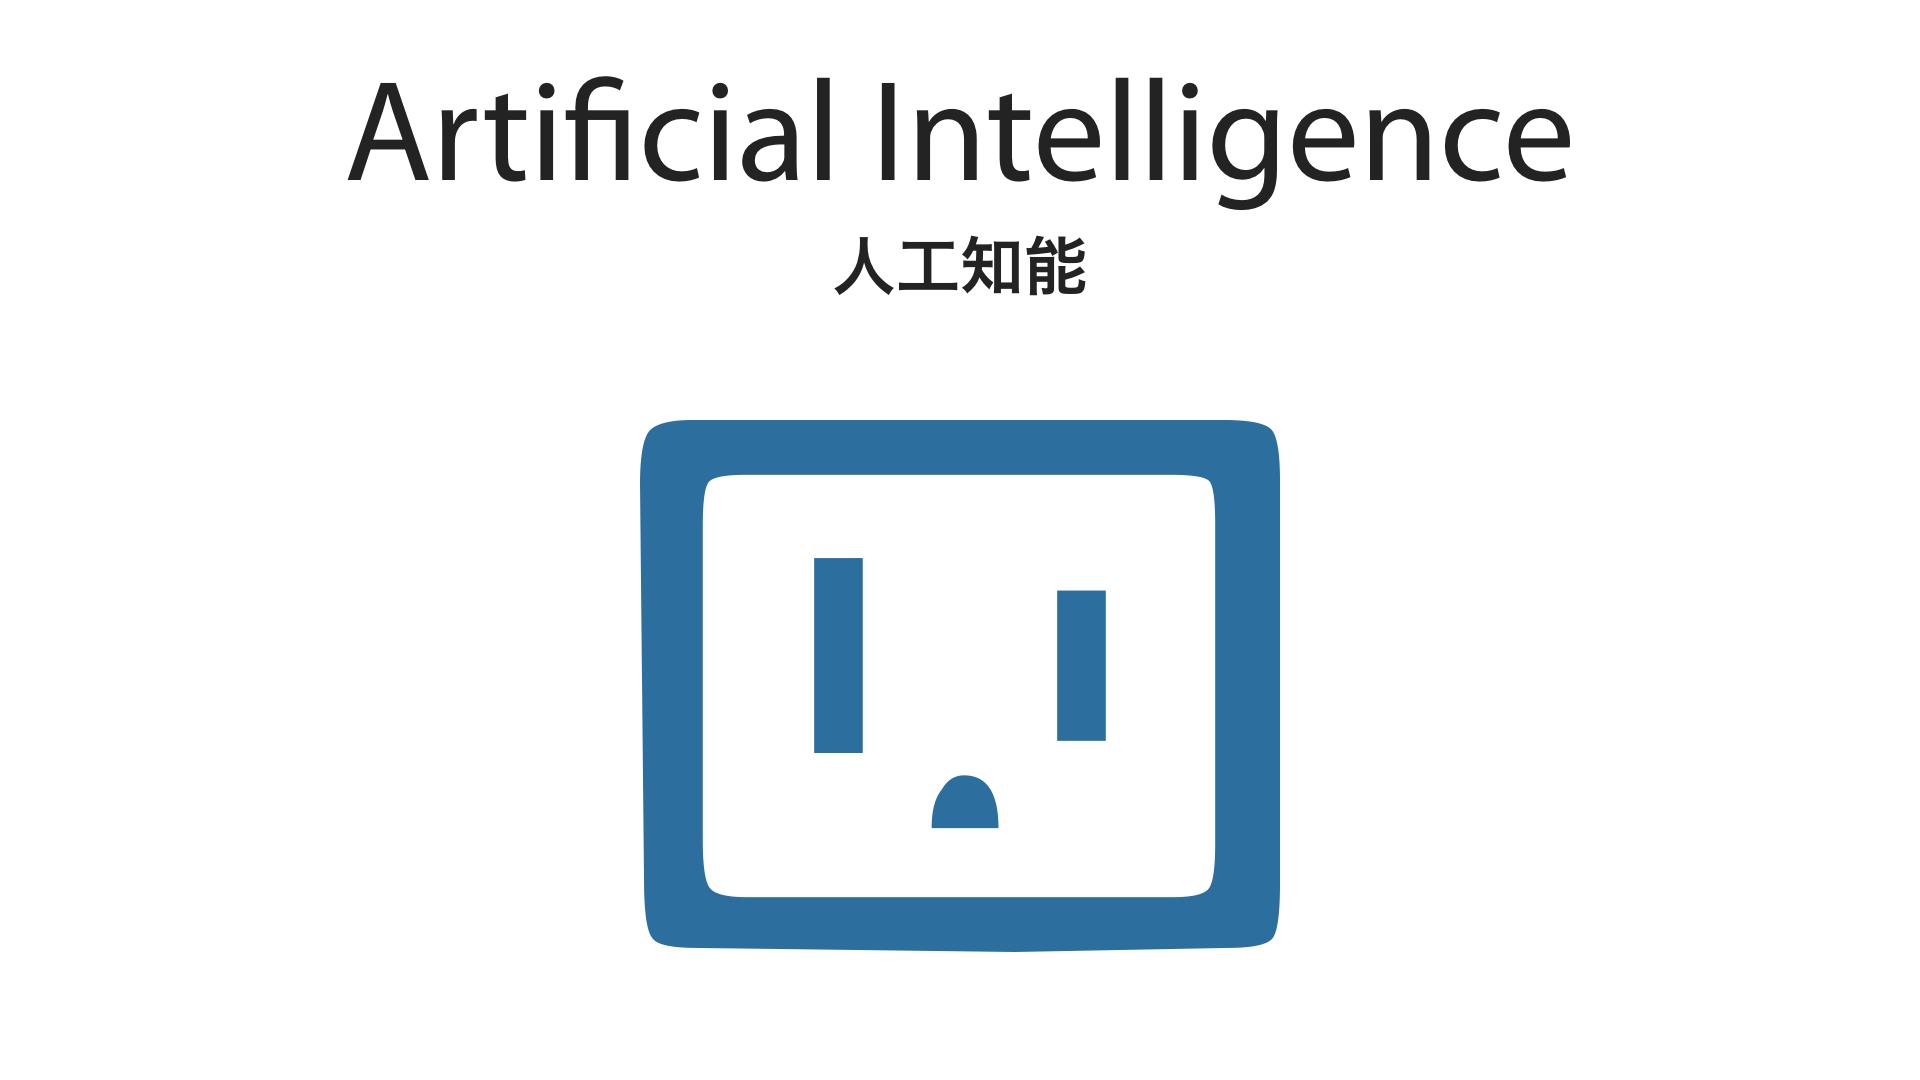 Artificial Intelligence 人工知能